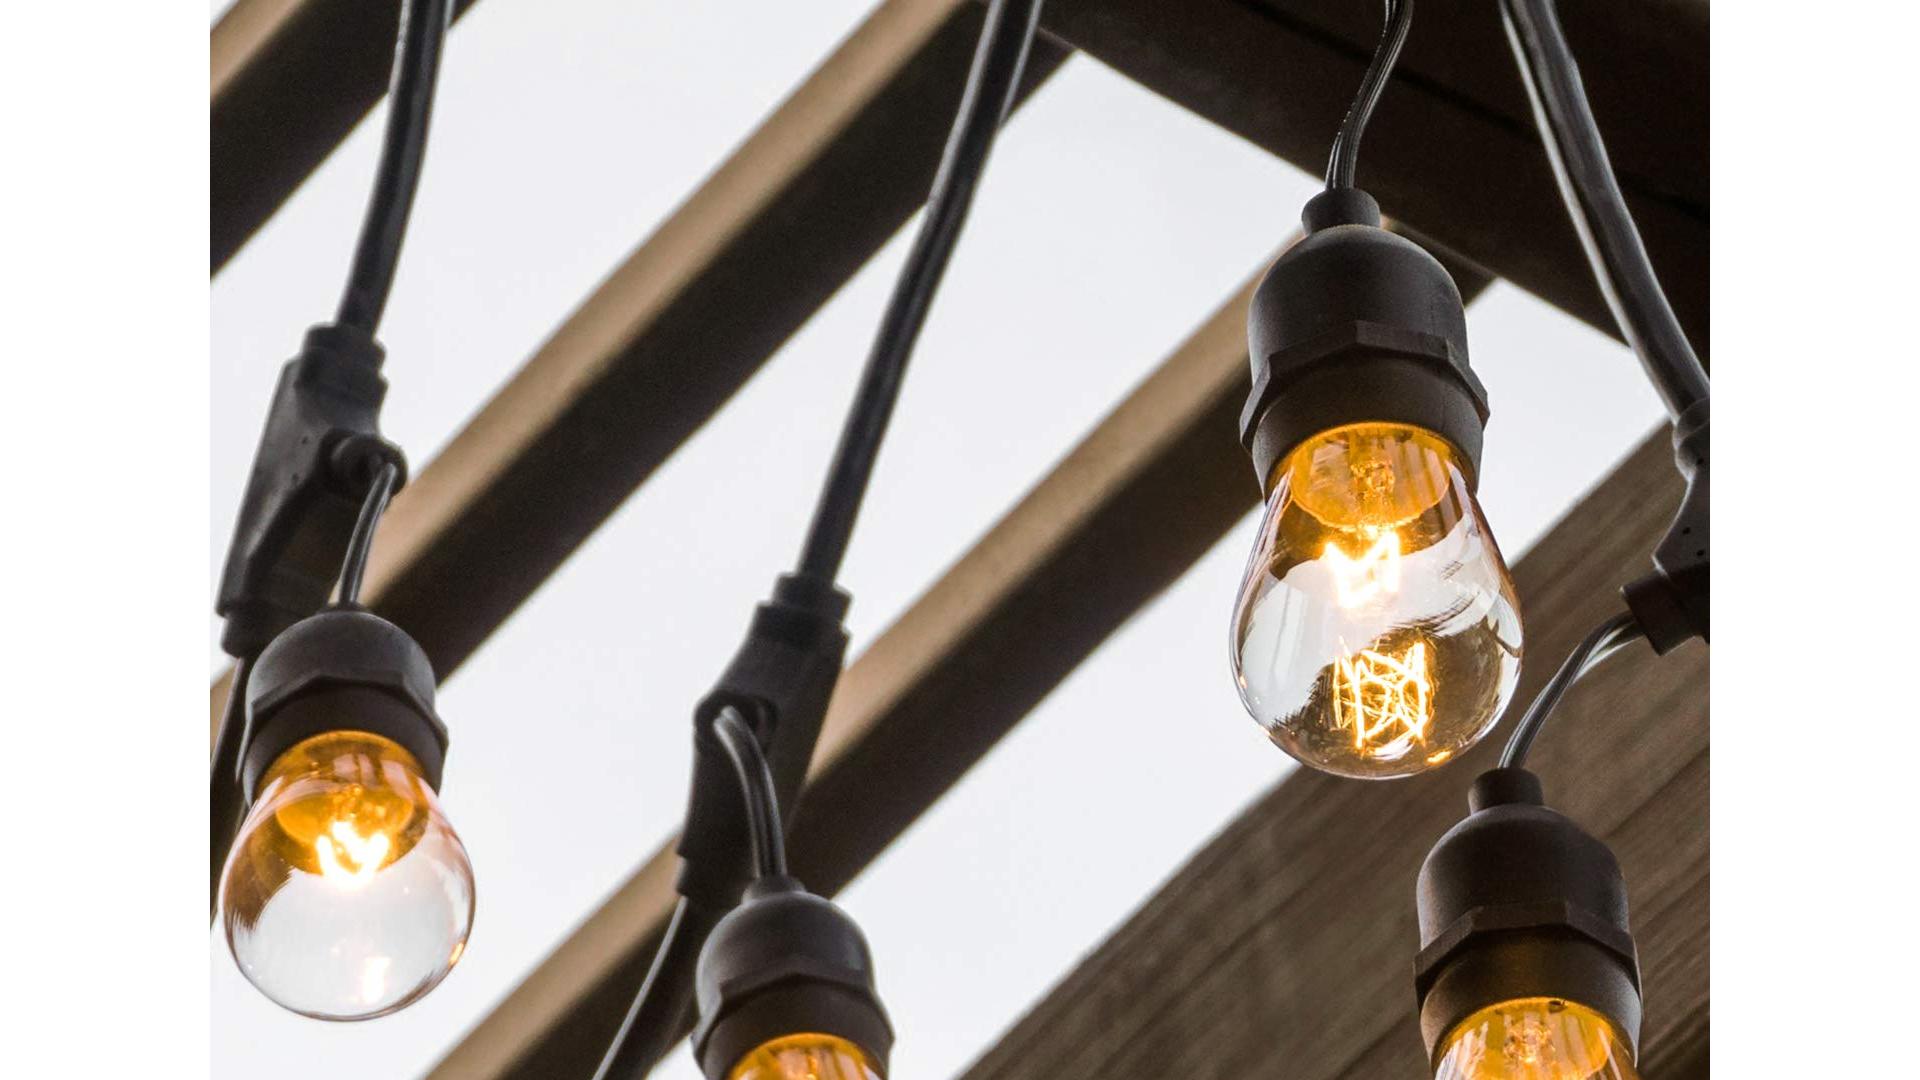 The Amico Edison String Lights